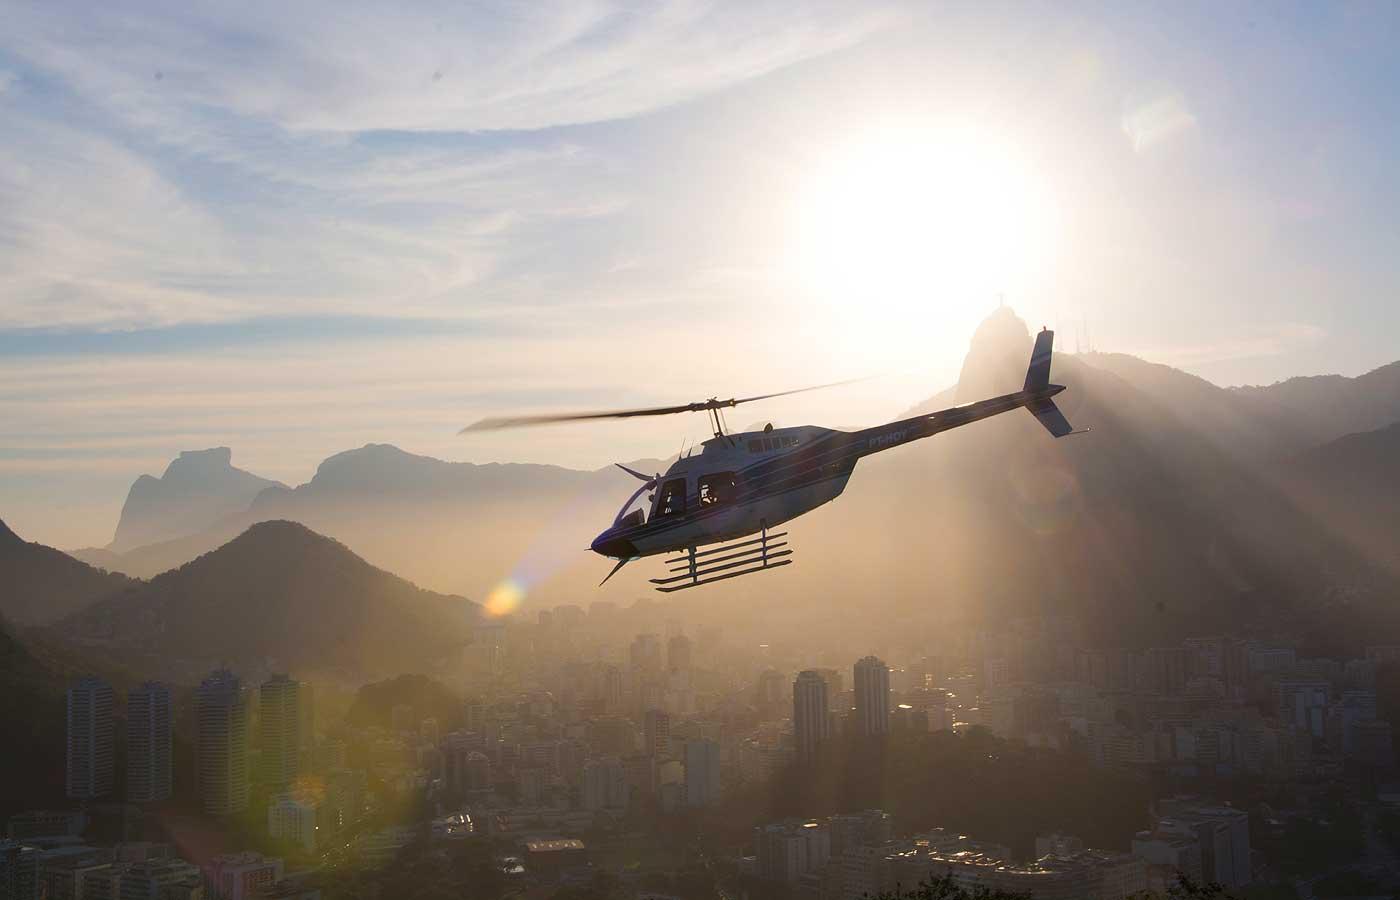 Helicopter over Rio de Janeiro, Brazil